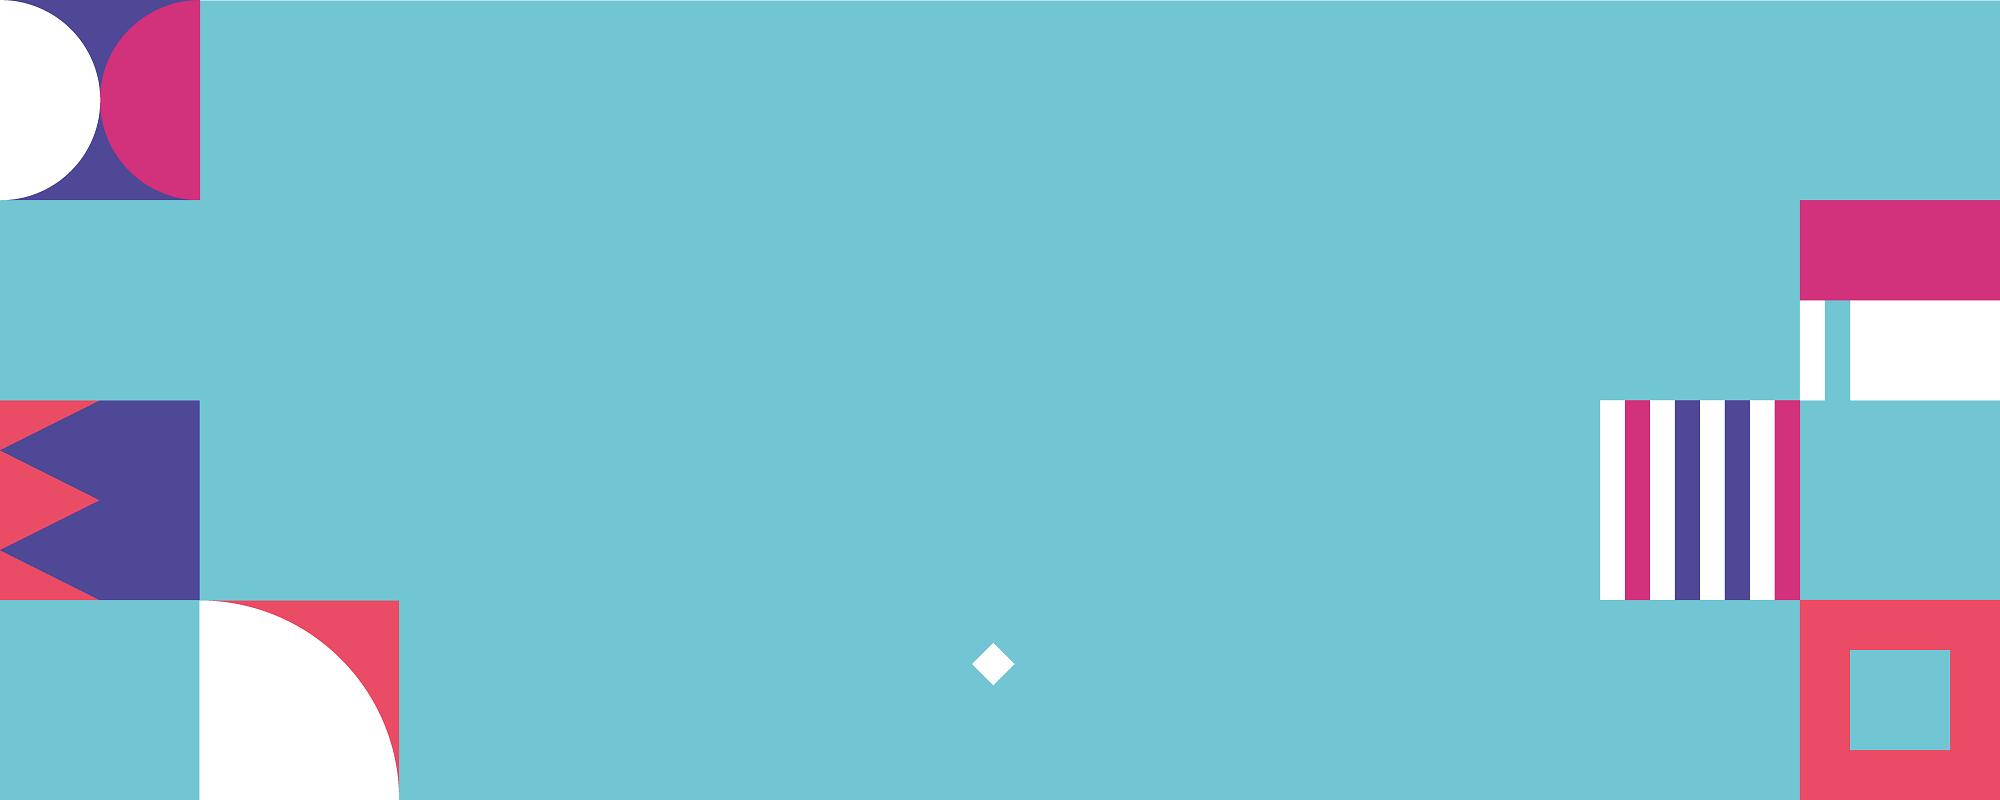 Puzzle_services_banner_branding_design